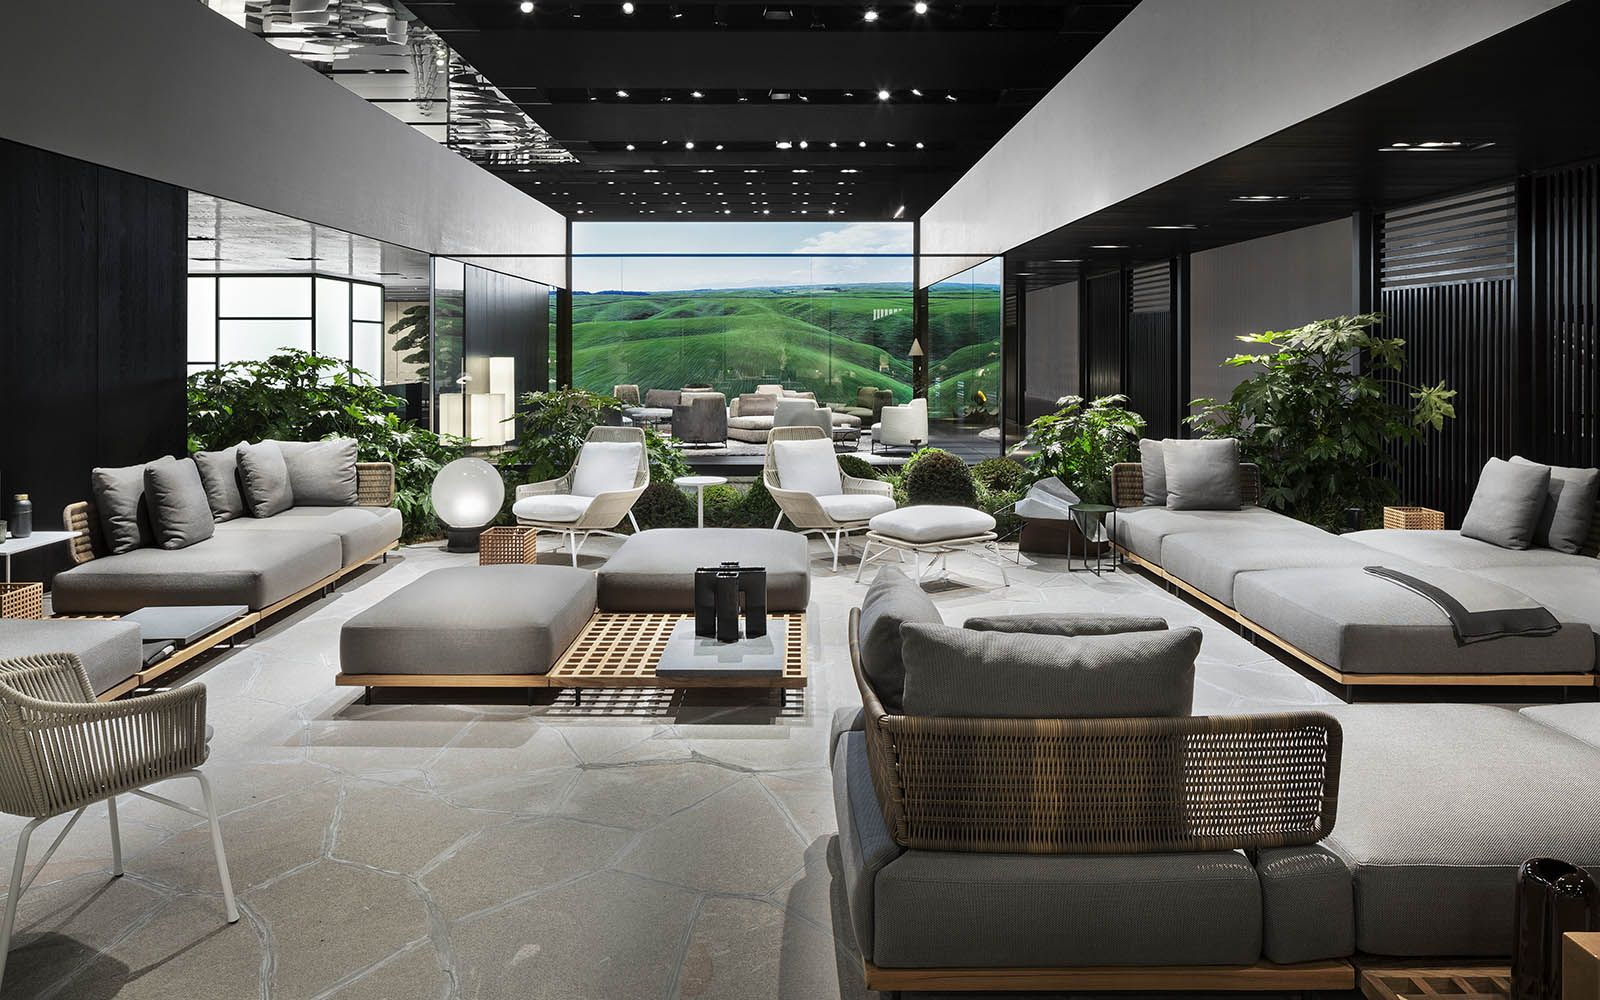 Quadrado outdoor seating system marcio kogan studio mk27 design prince cord outdoor armchair rodolfo dordoni design